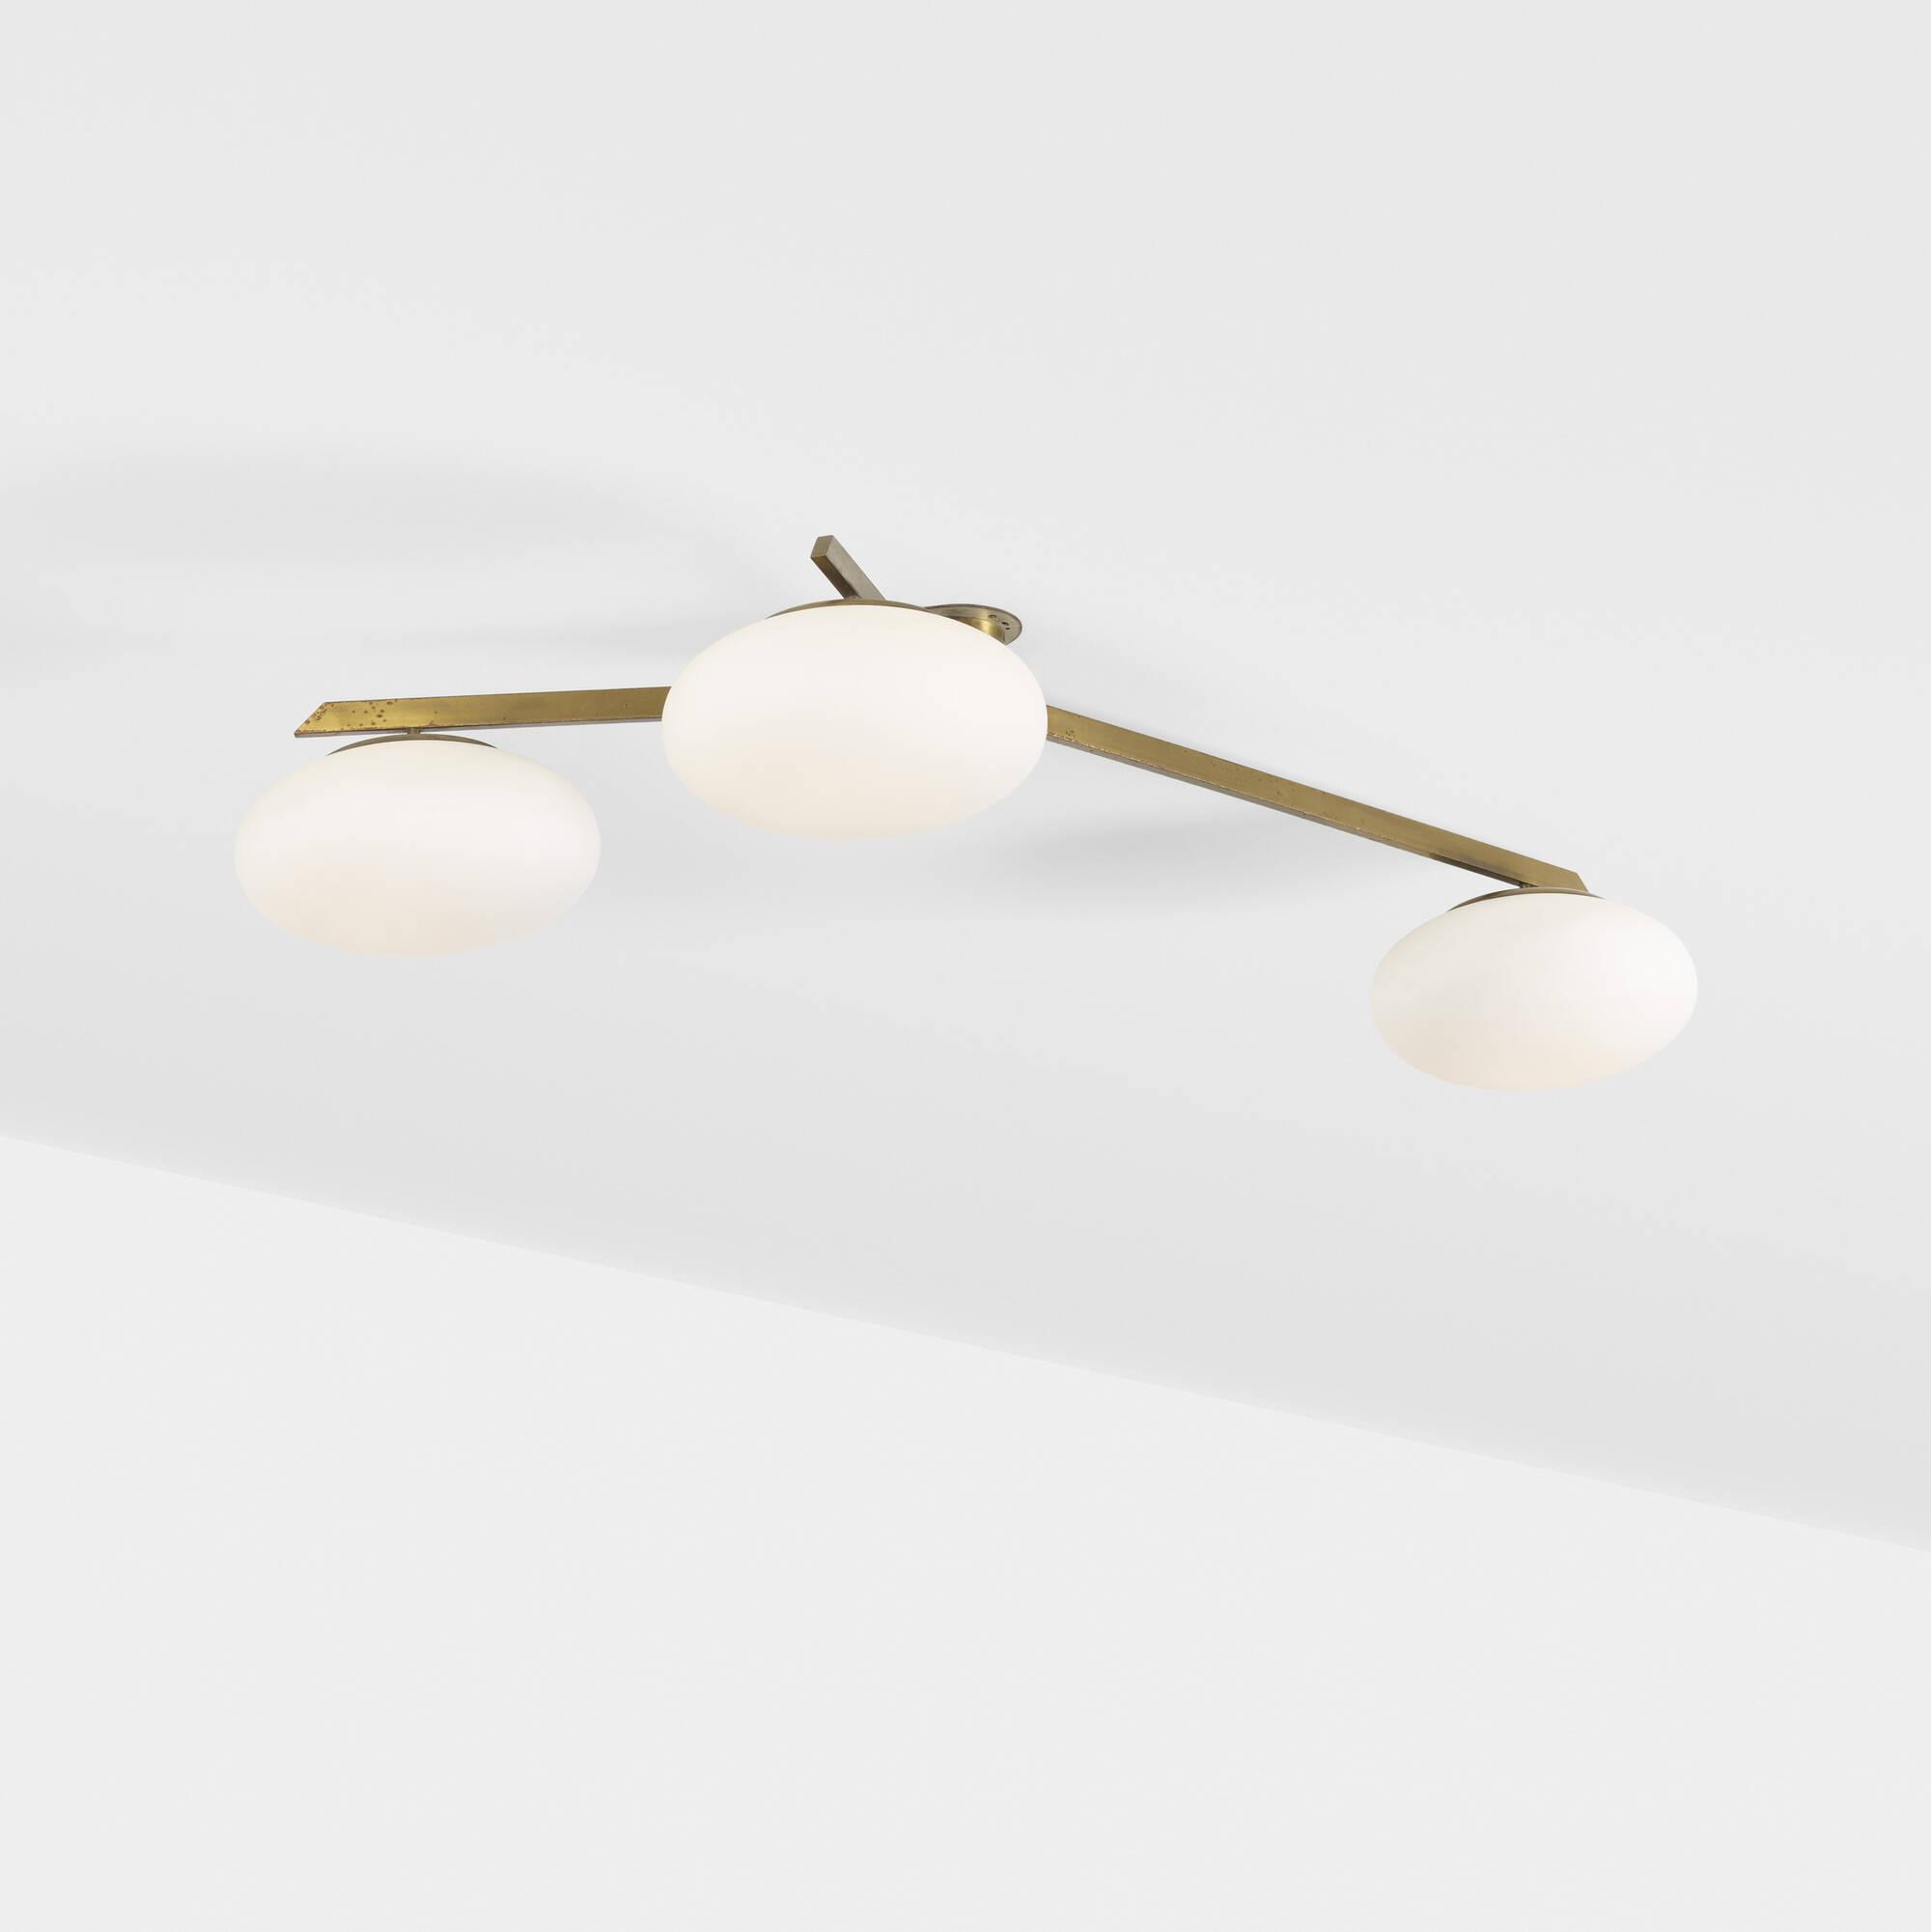 305: Angelo Lelii / ceiling light (1 of 1)